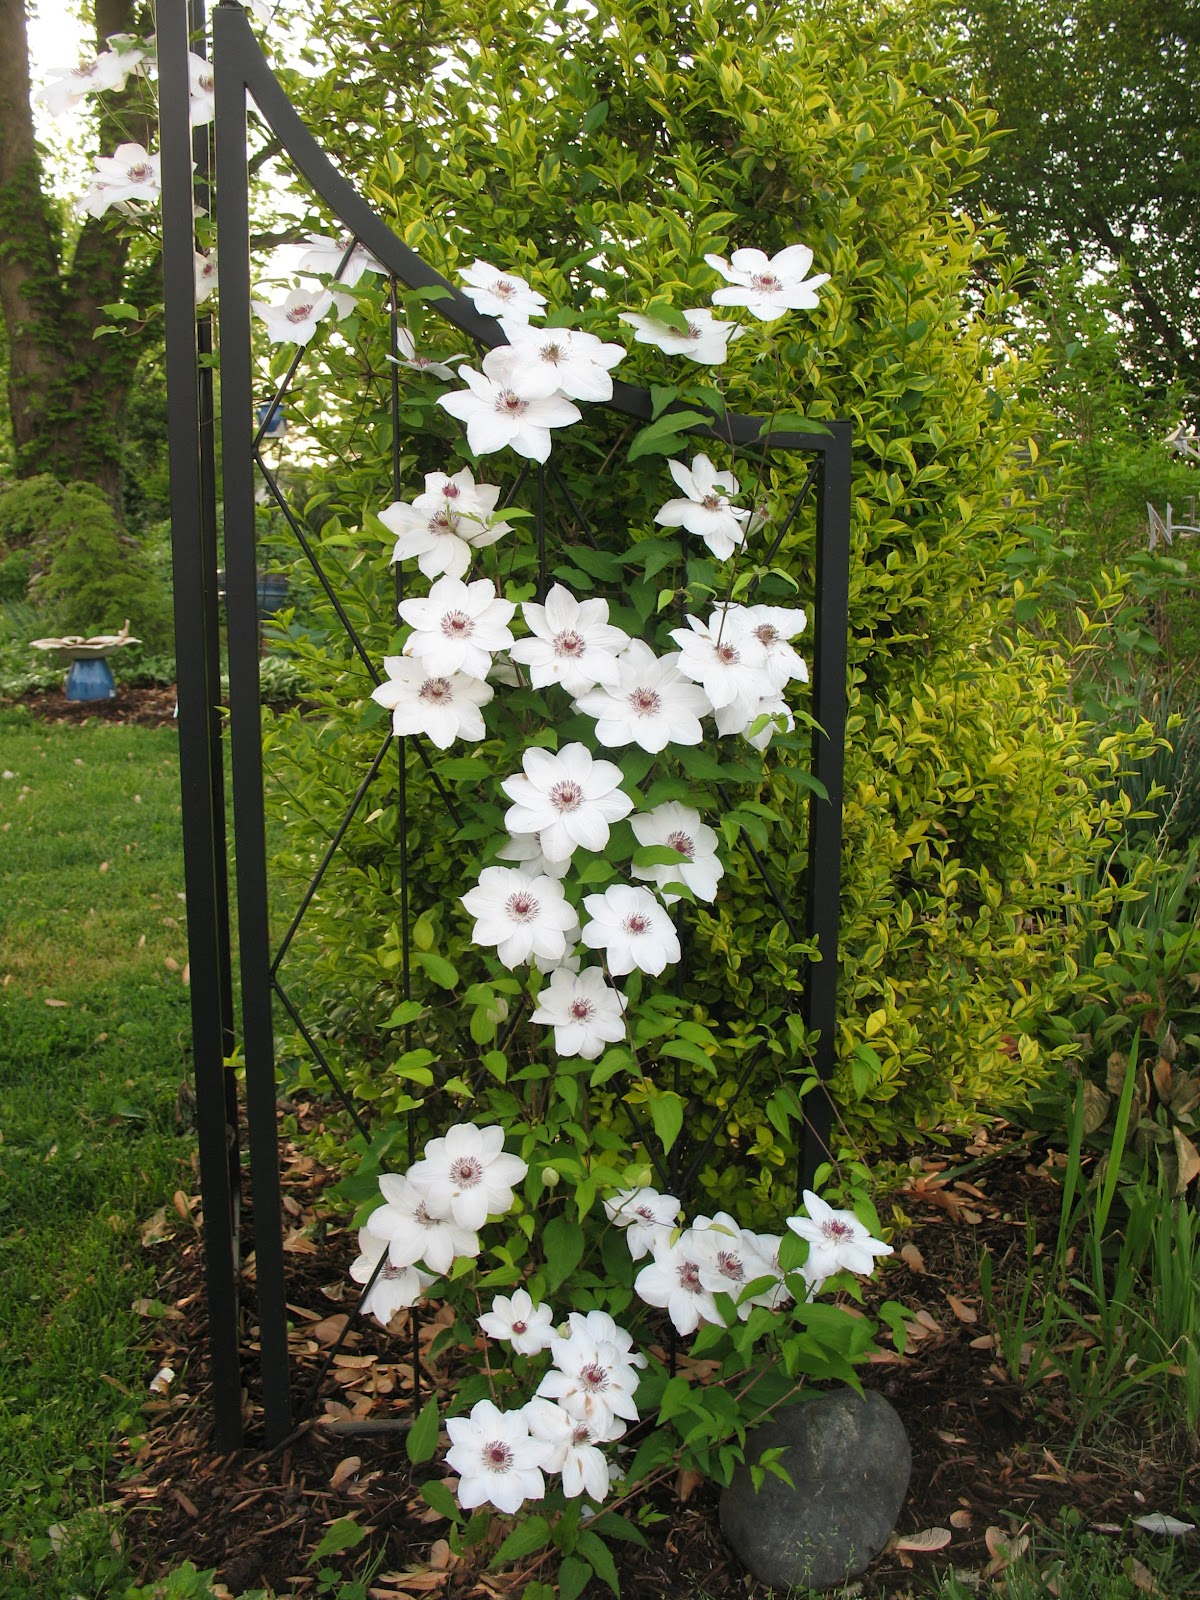 greenbow garden bloggers bloom day april 2012. Black Bedroom Furniture Sets. Home Design Ideas